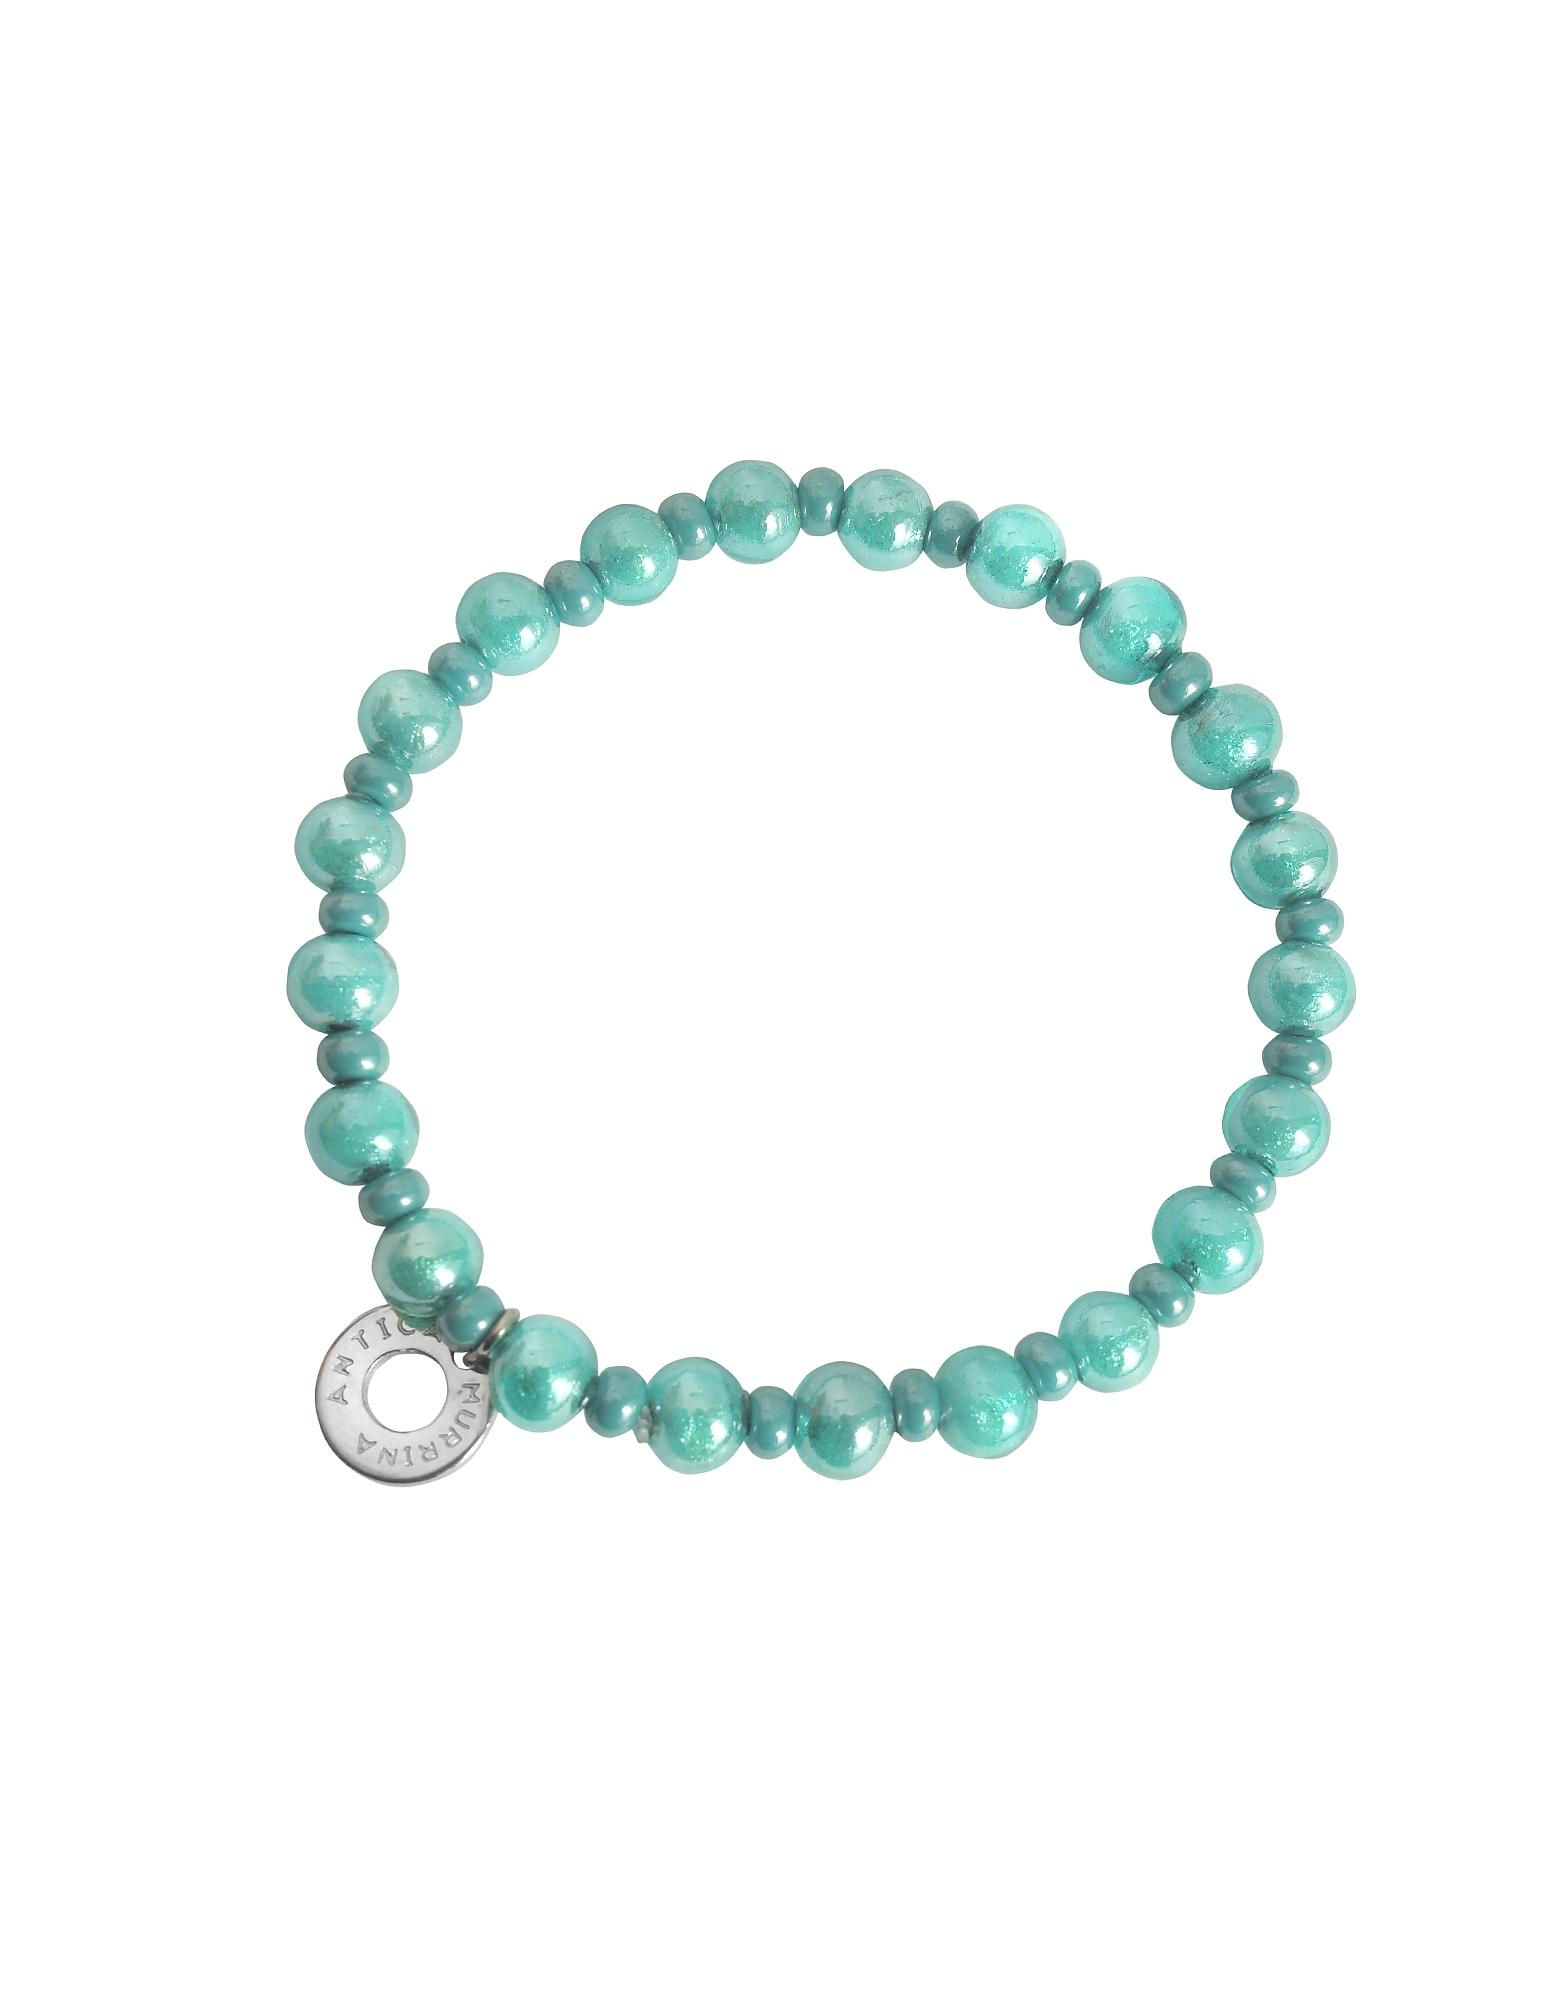 Antica Murrina Bracelets, Perleadi Turquoise Murano Glass Beads Bracelet